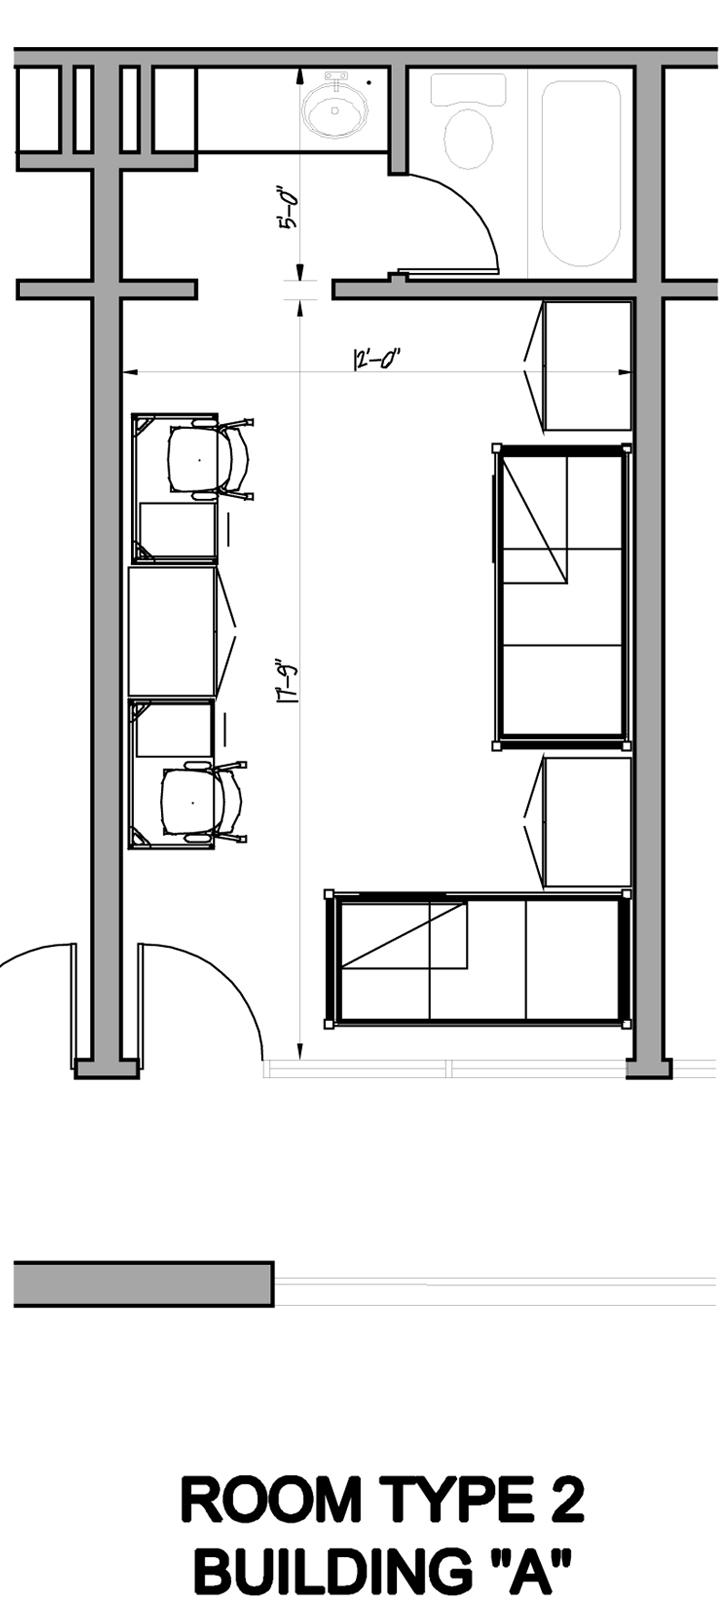 Bldg A Room Type 2.jpg